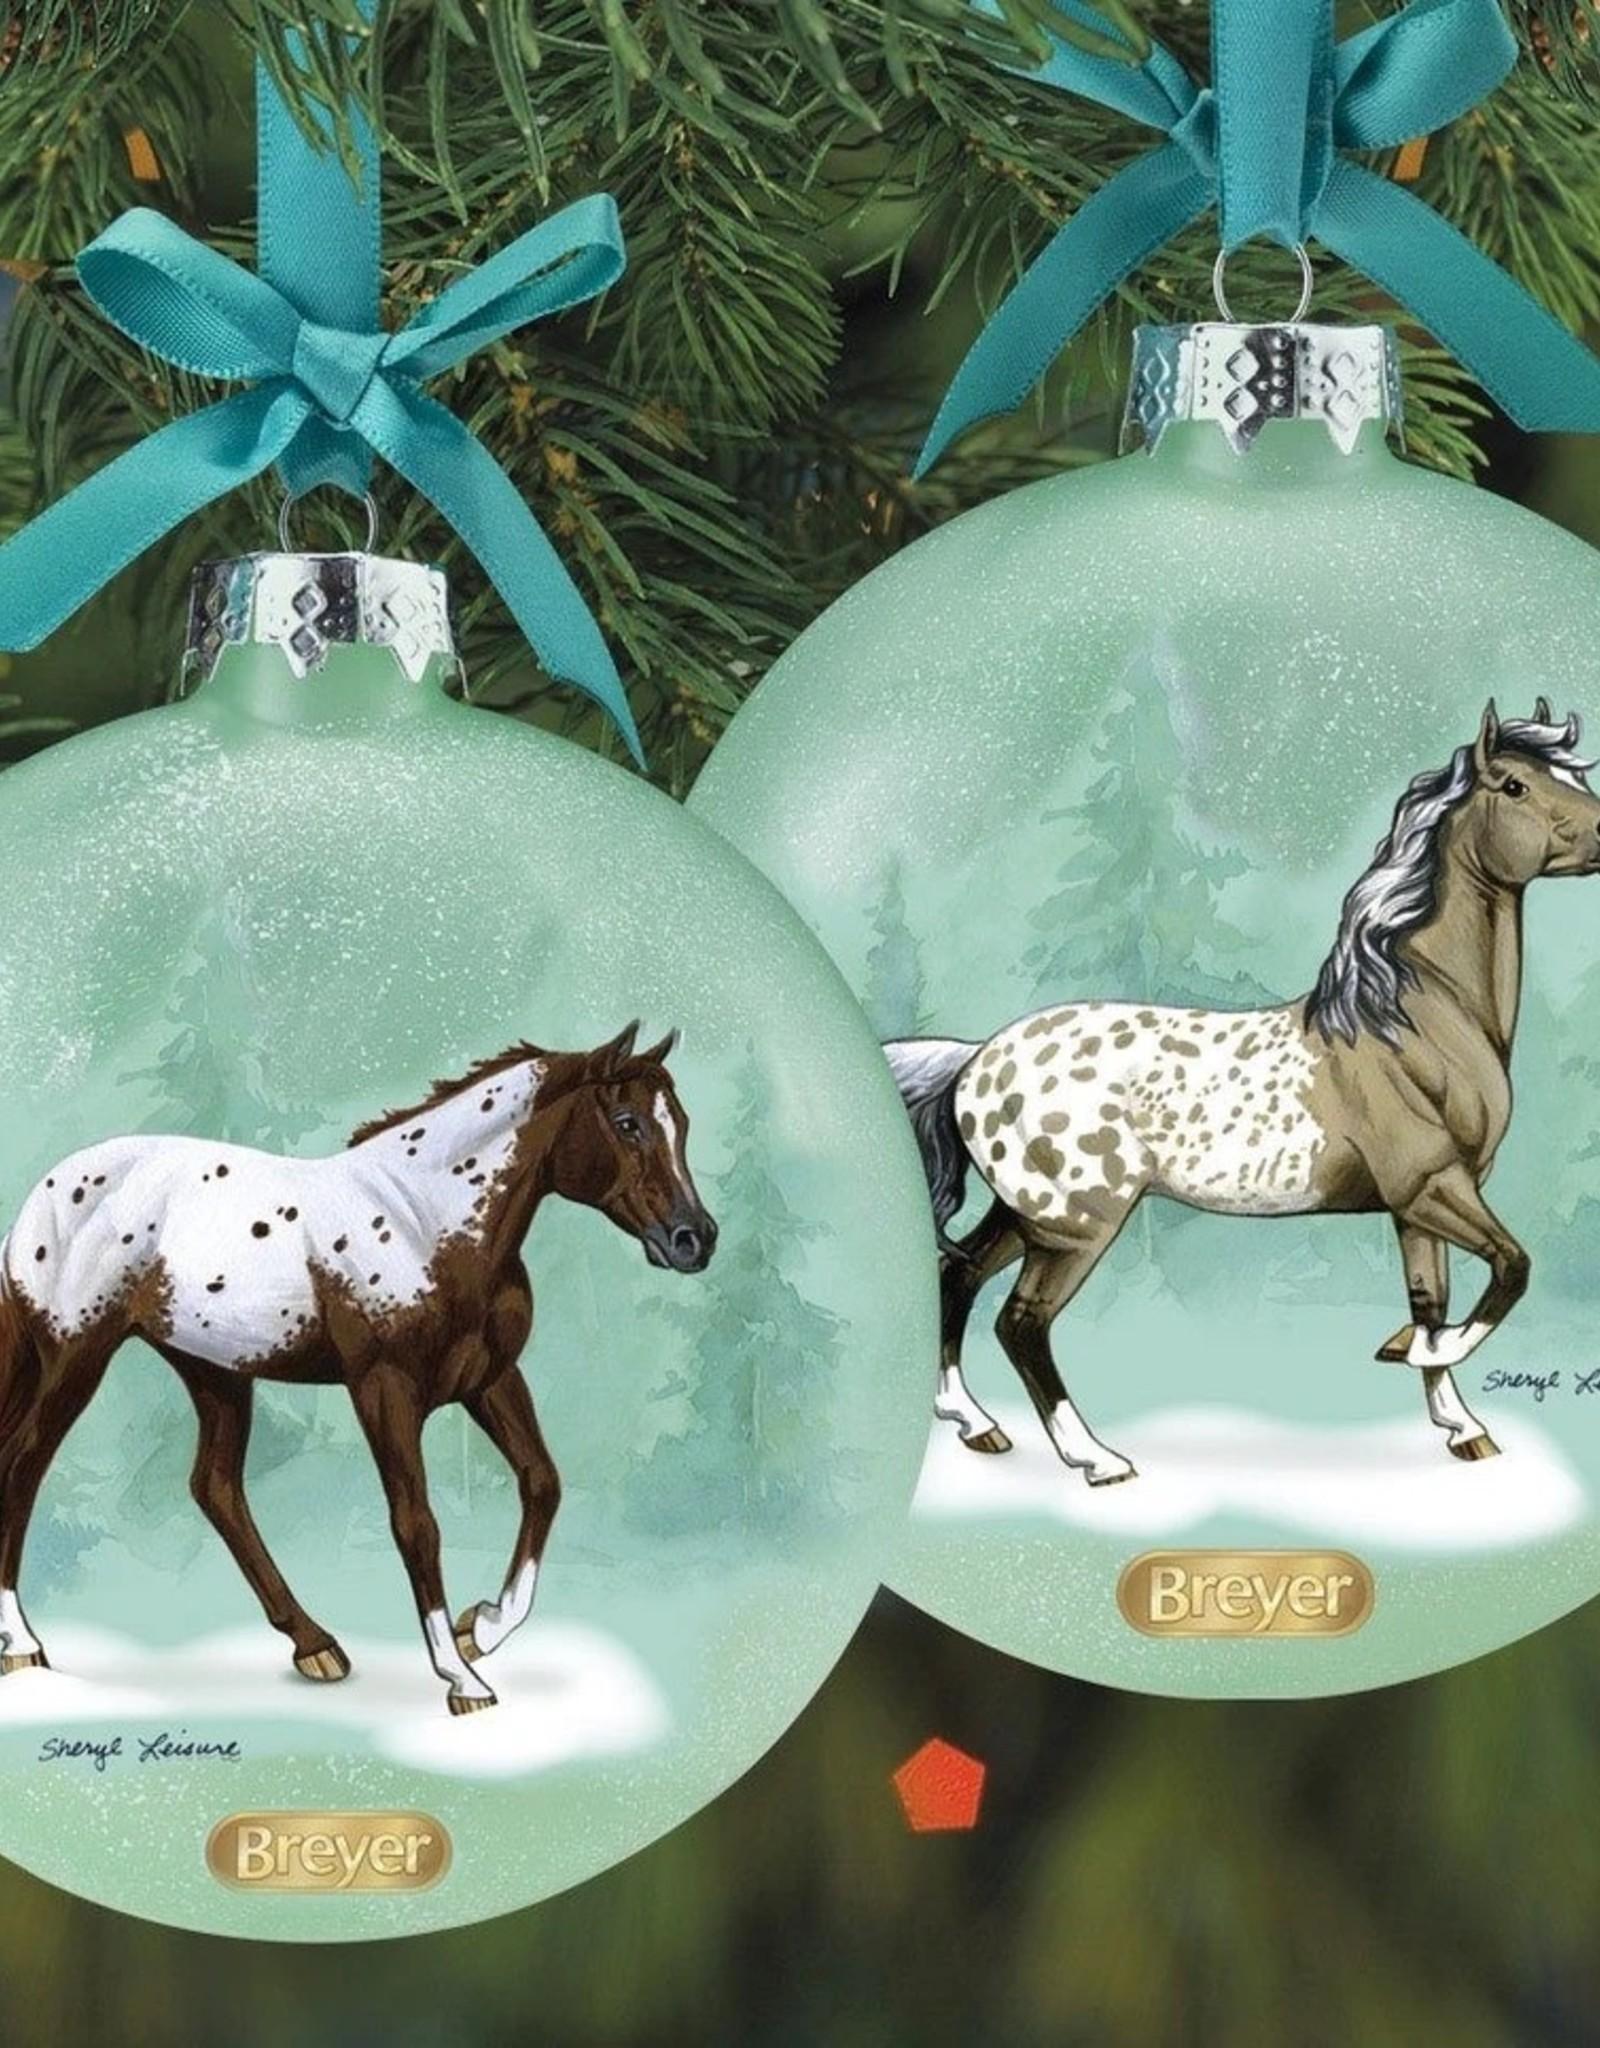 Breyer Artist Signature Appaloosas Double-Sided Ornament